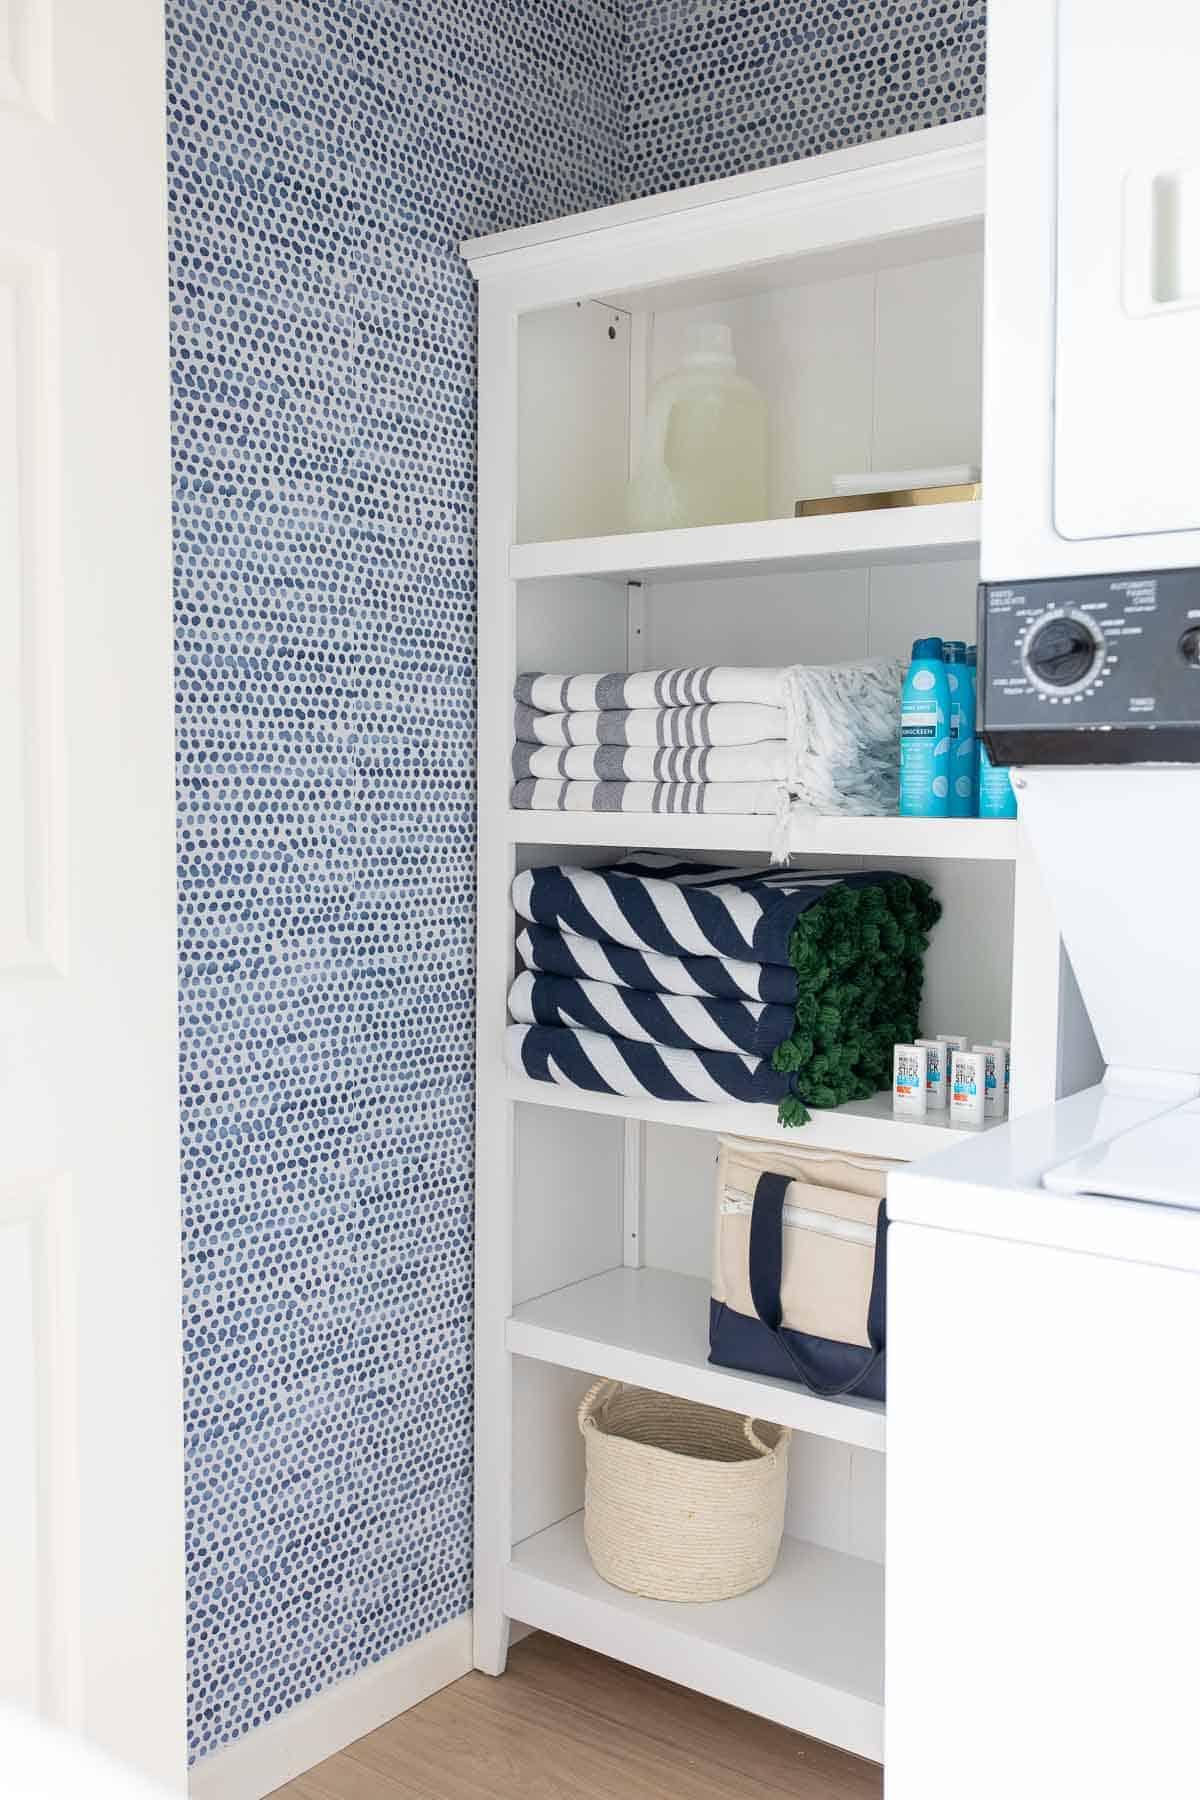 laundry closet with storage shelves